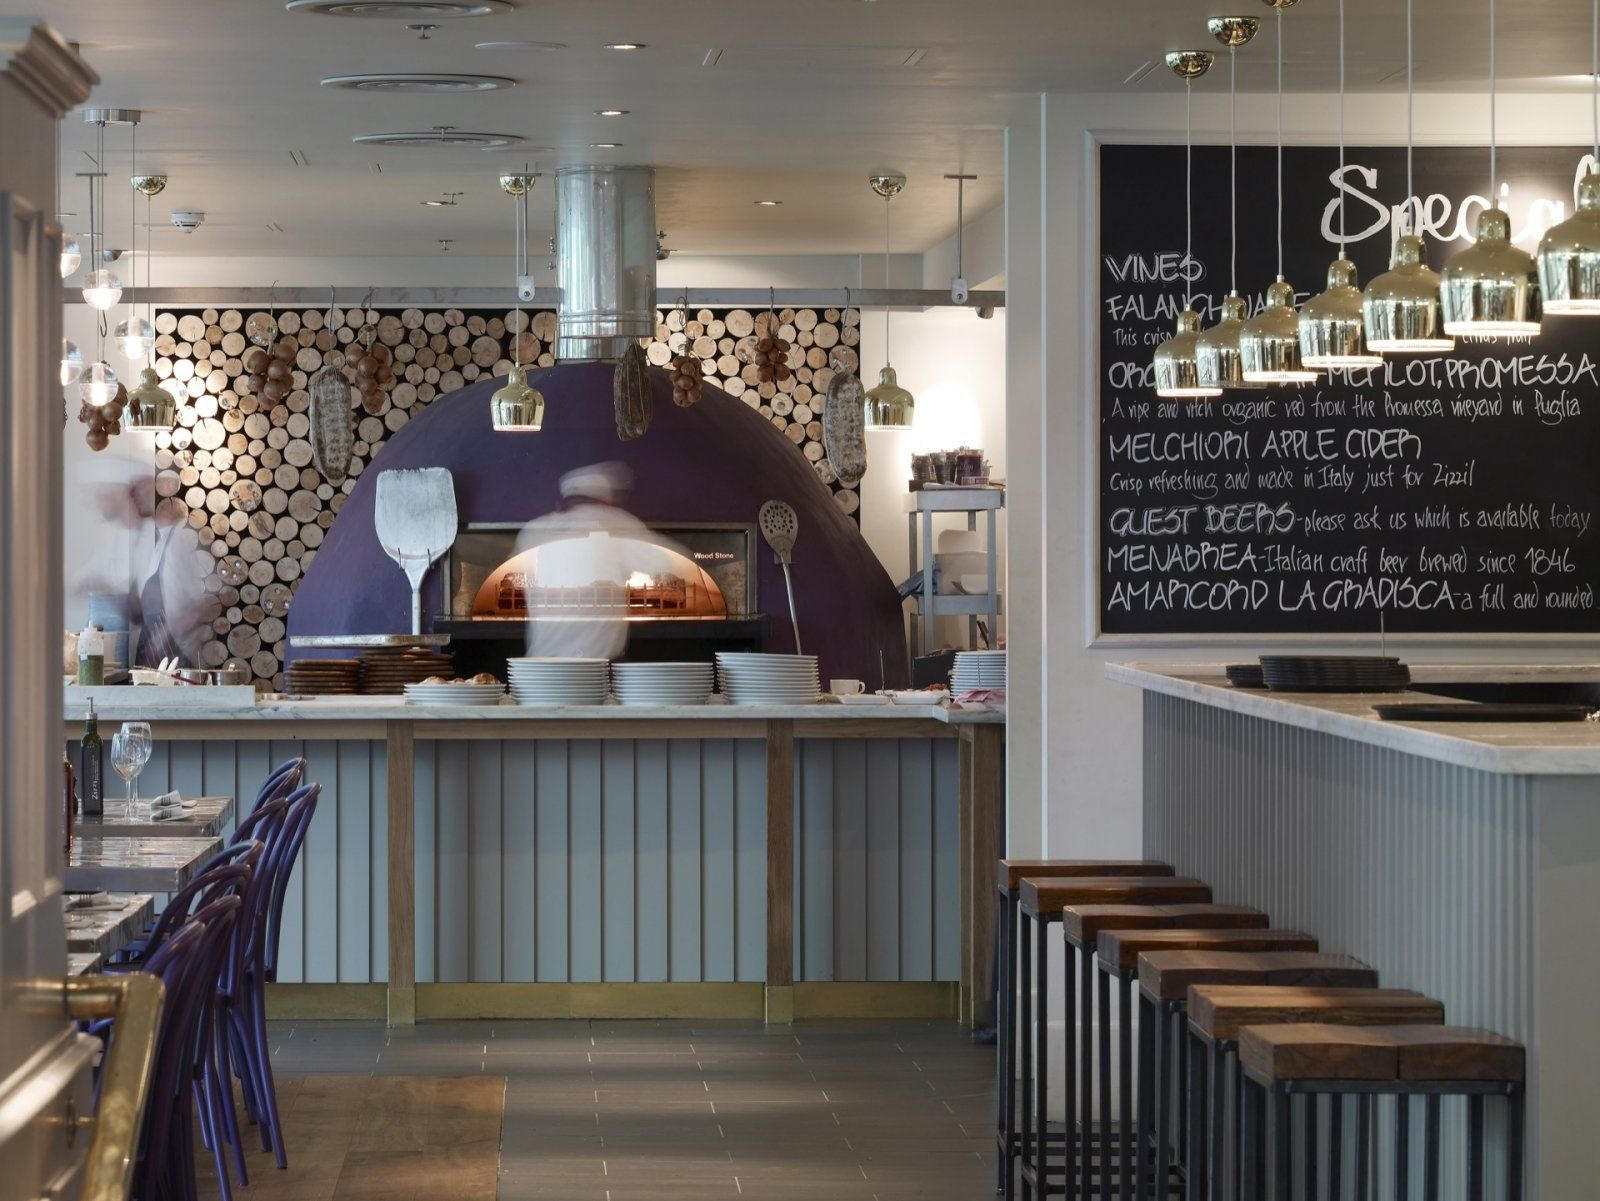 zizzi london interior design - Google Search | Vejle Life ...